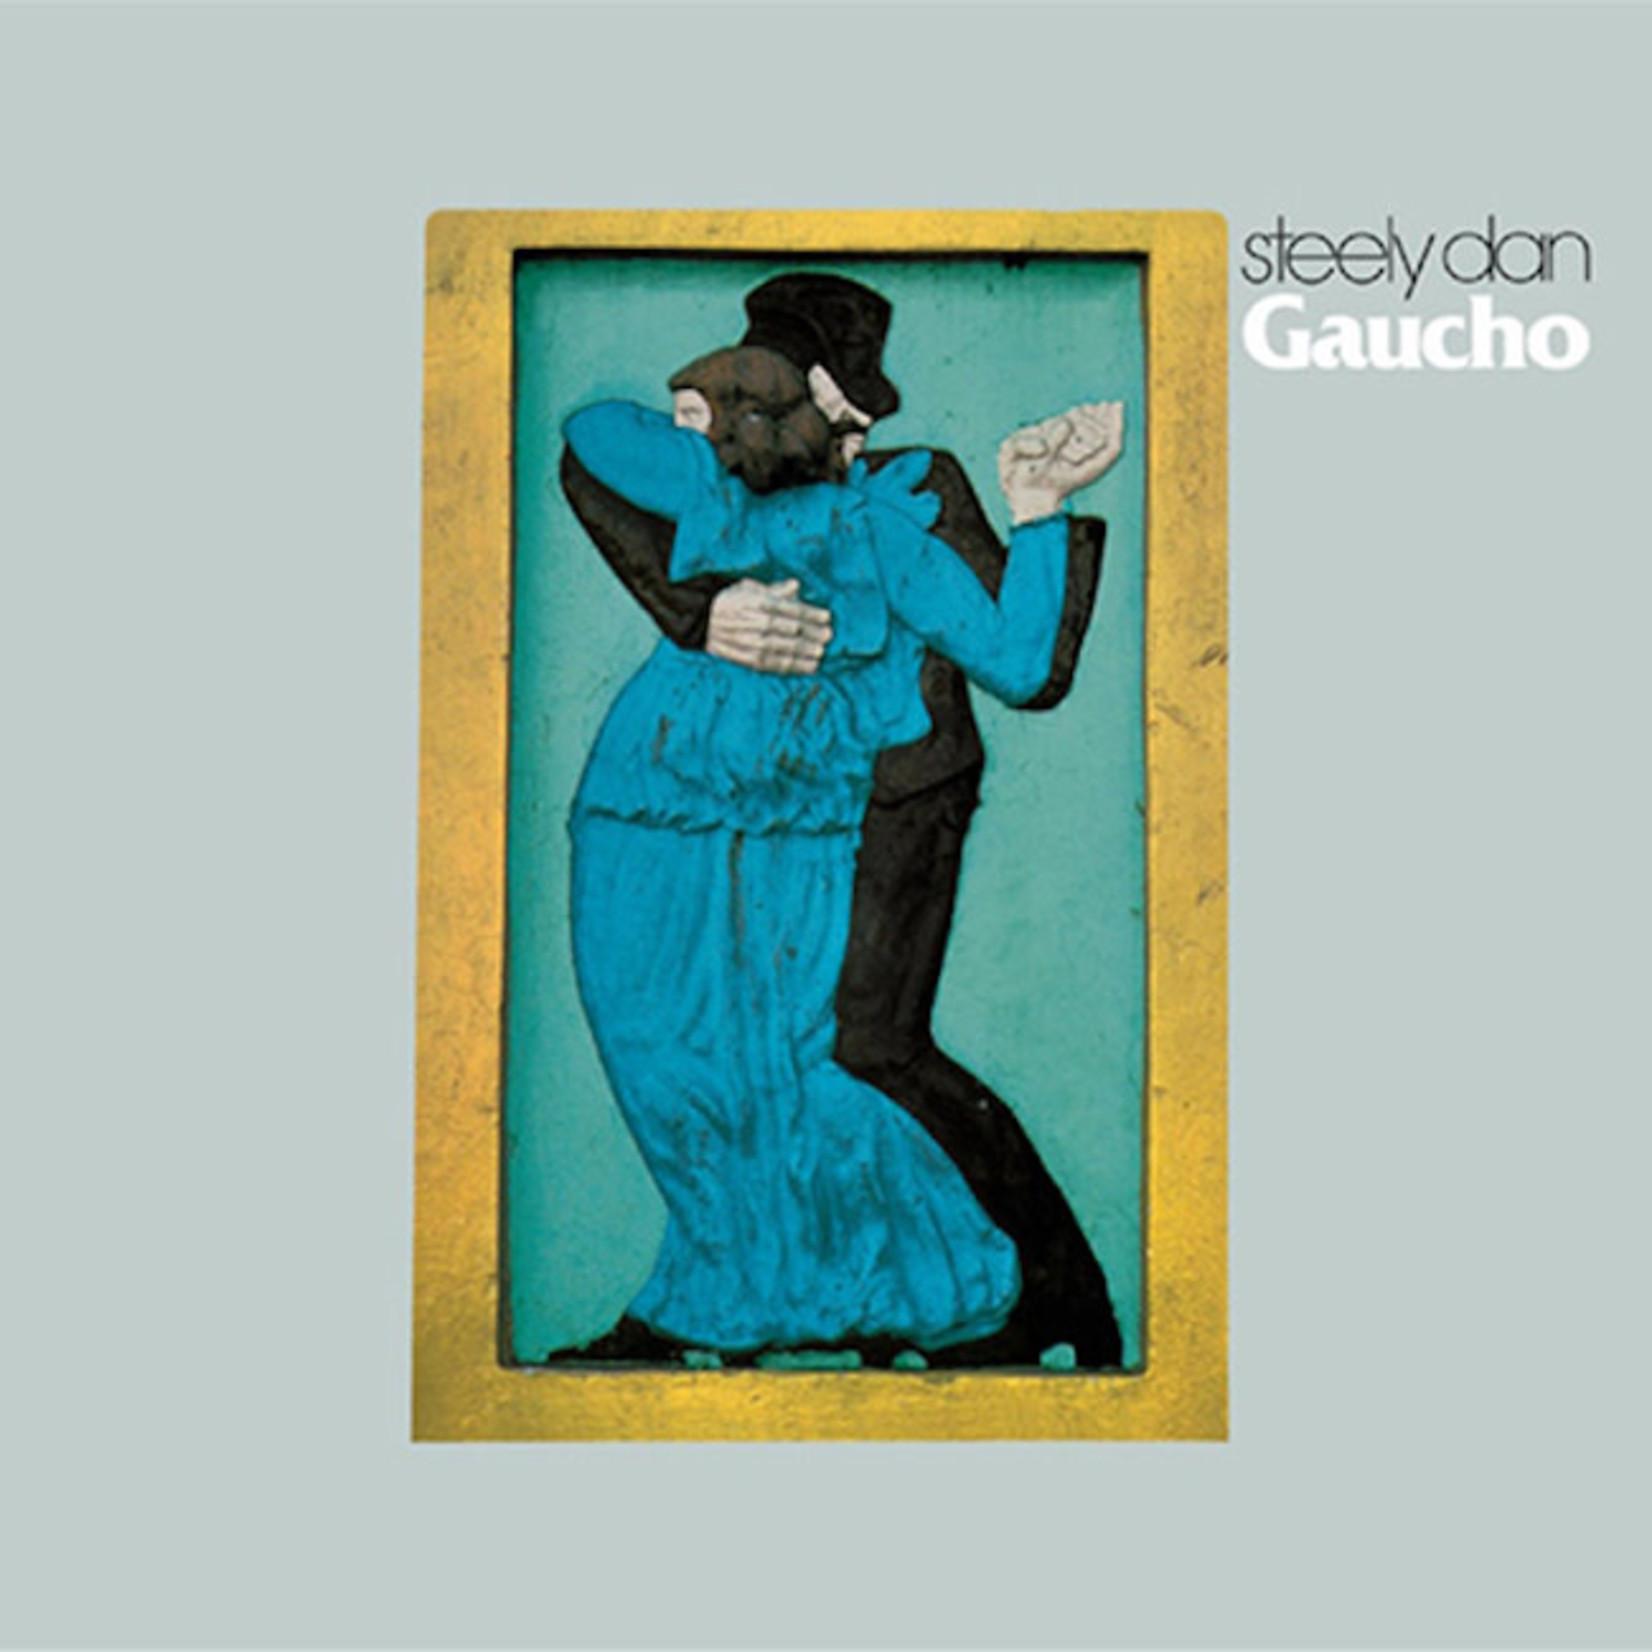 [New] Steely Dan: Gaucho